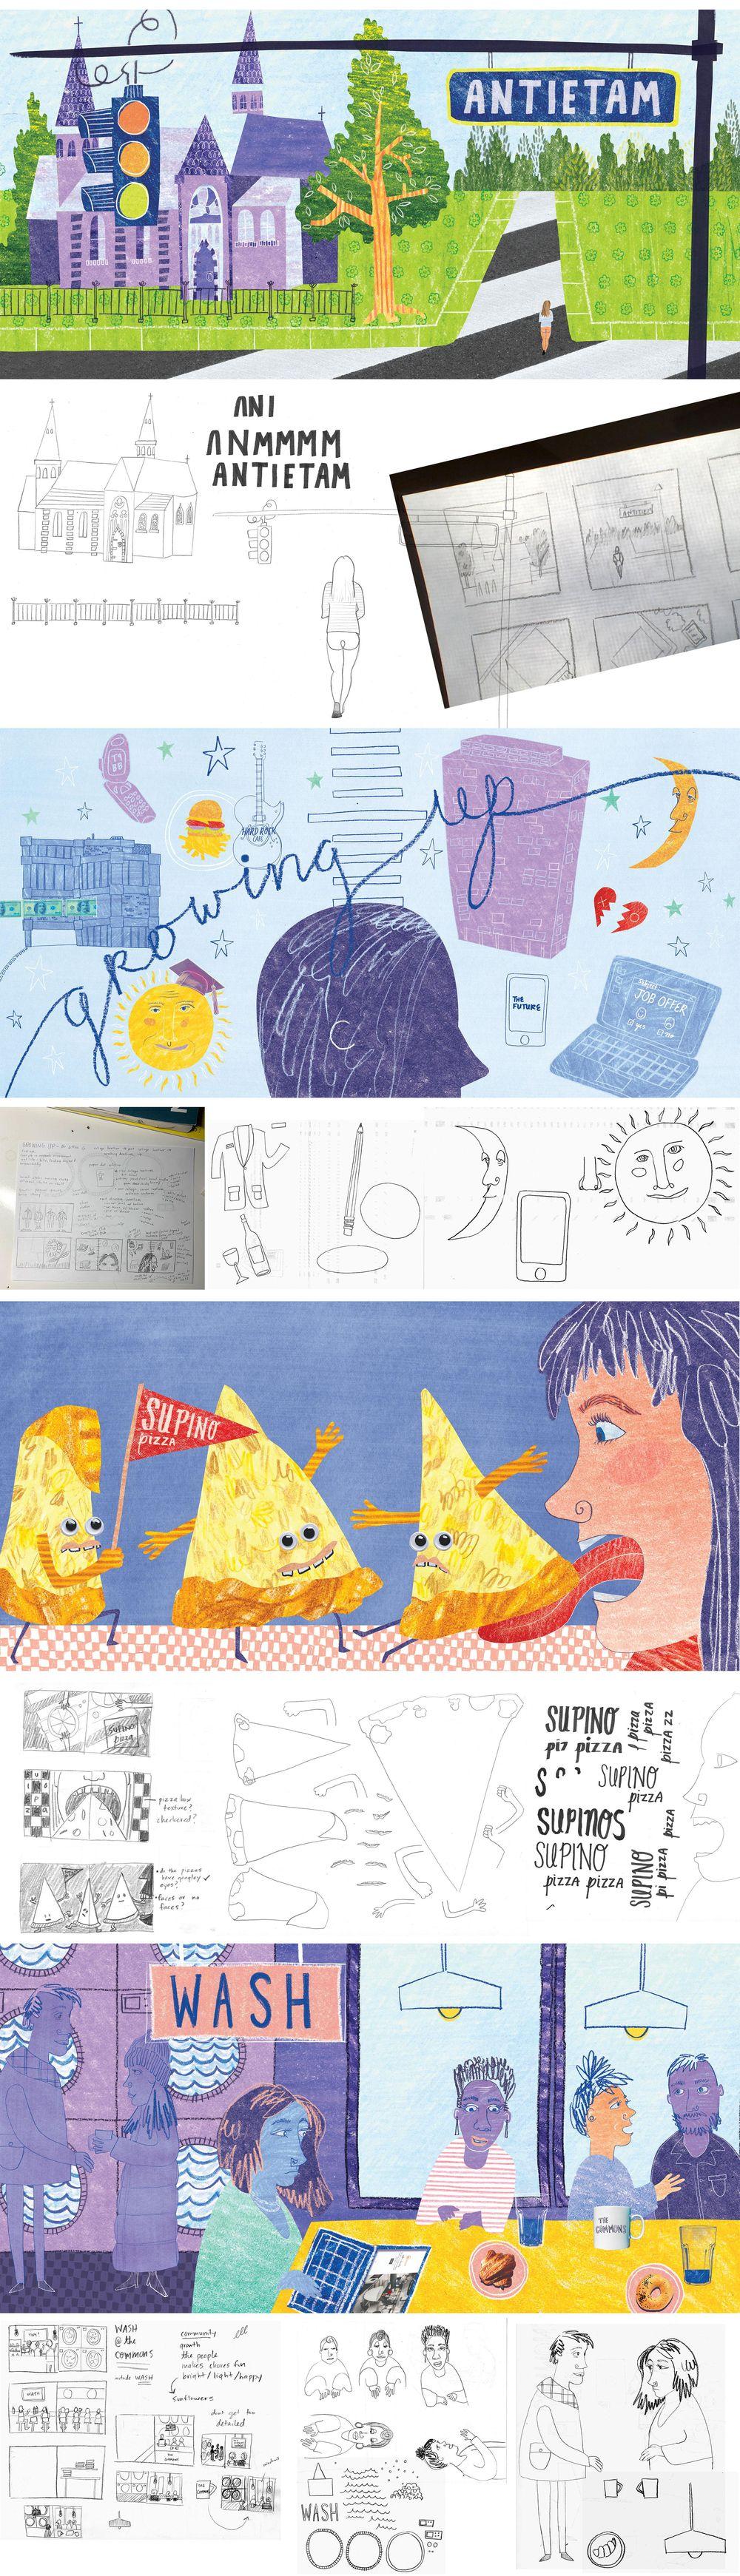 Pilot Illustrations - image 1 - student project